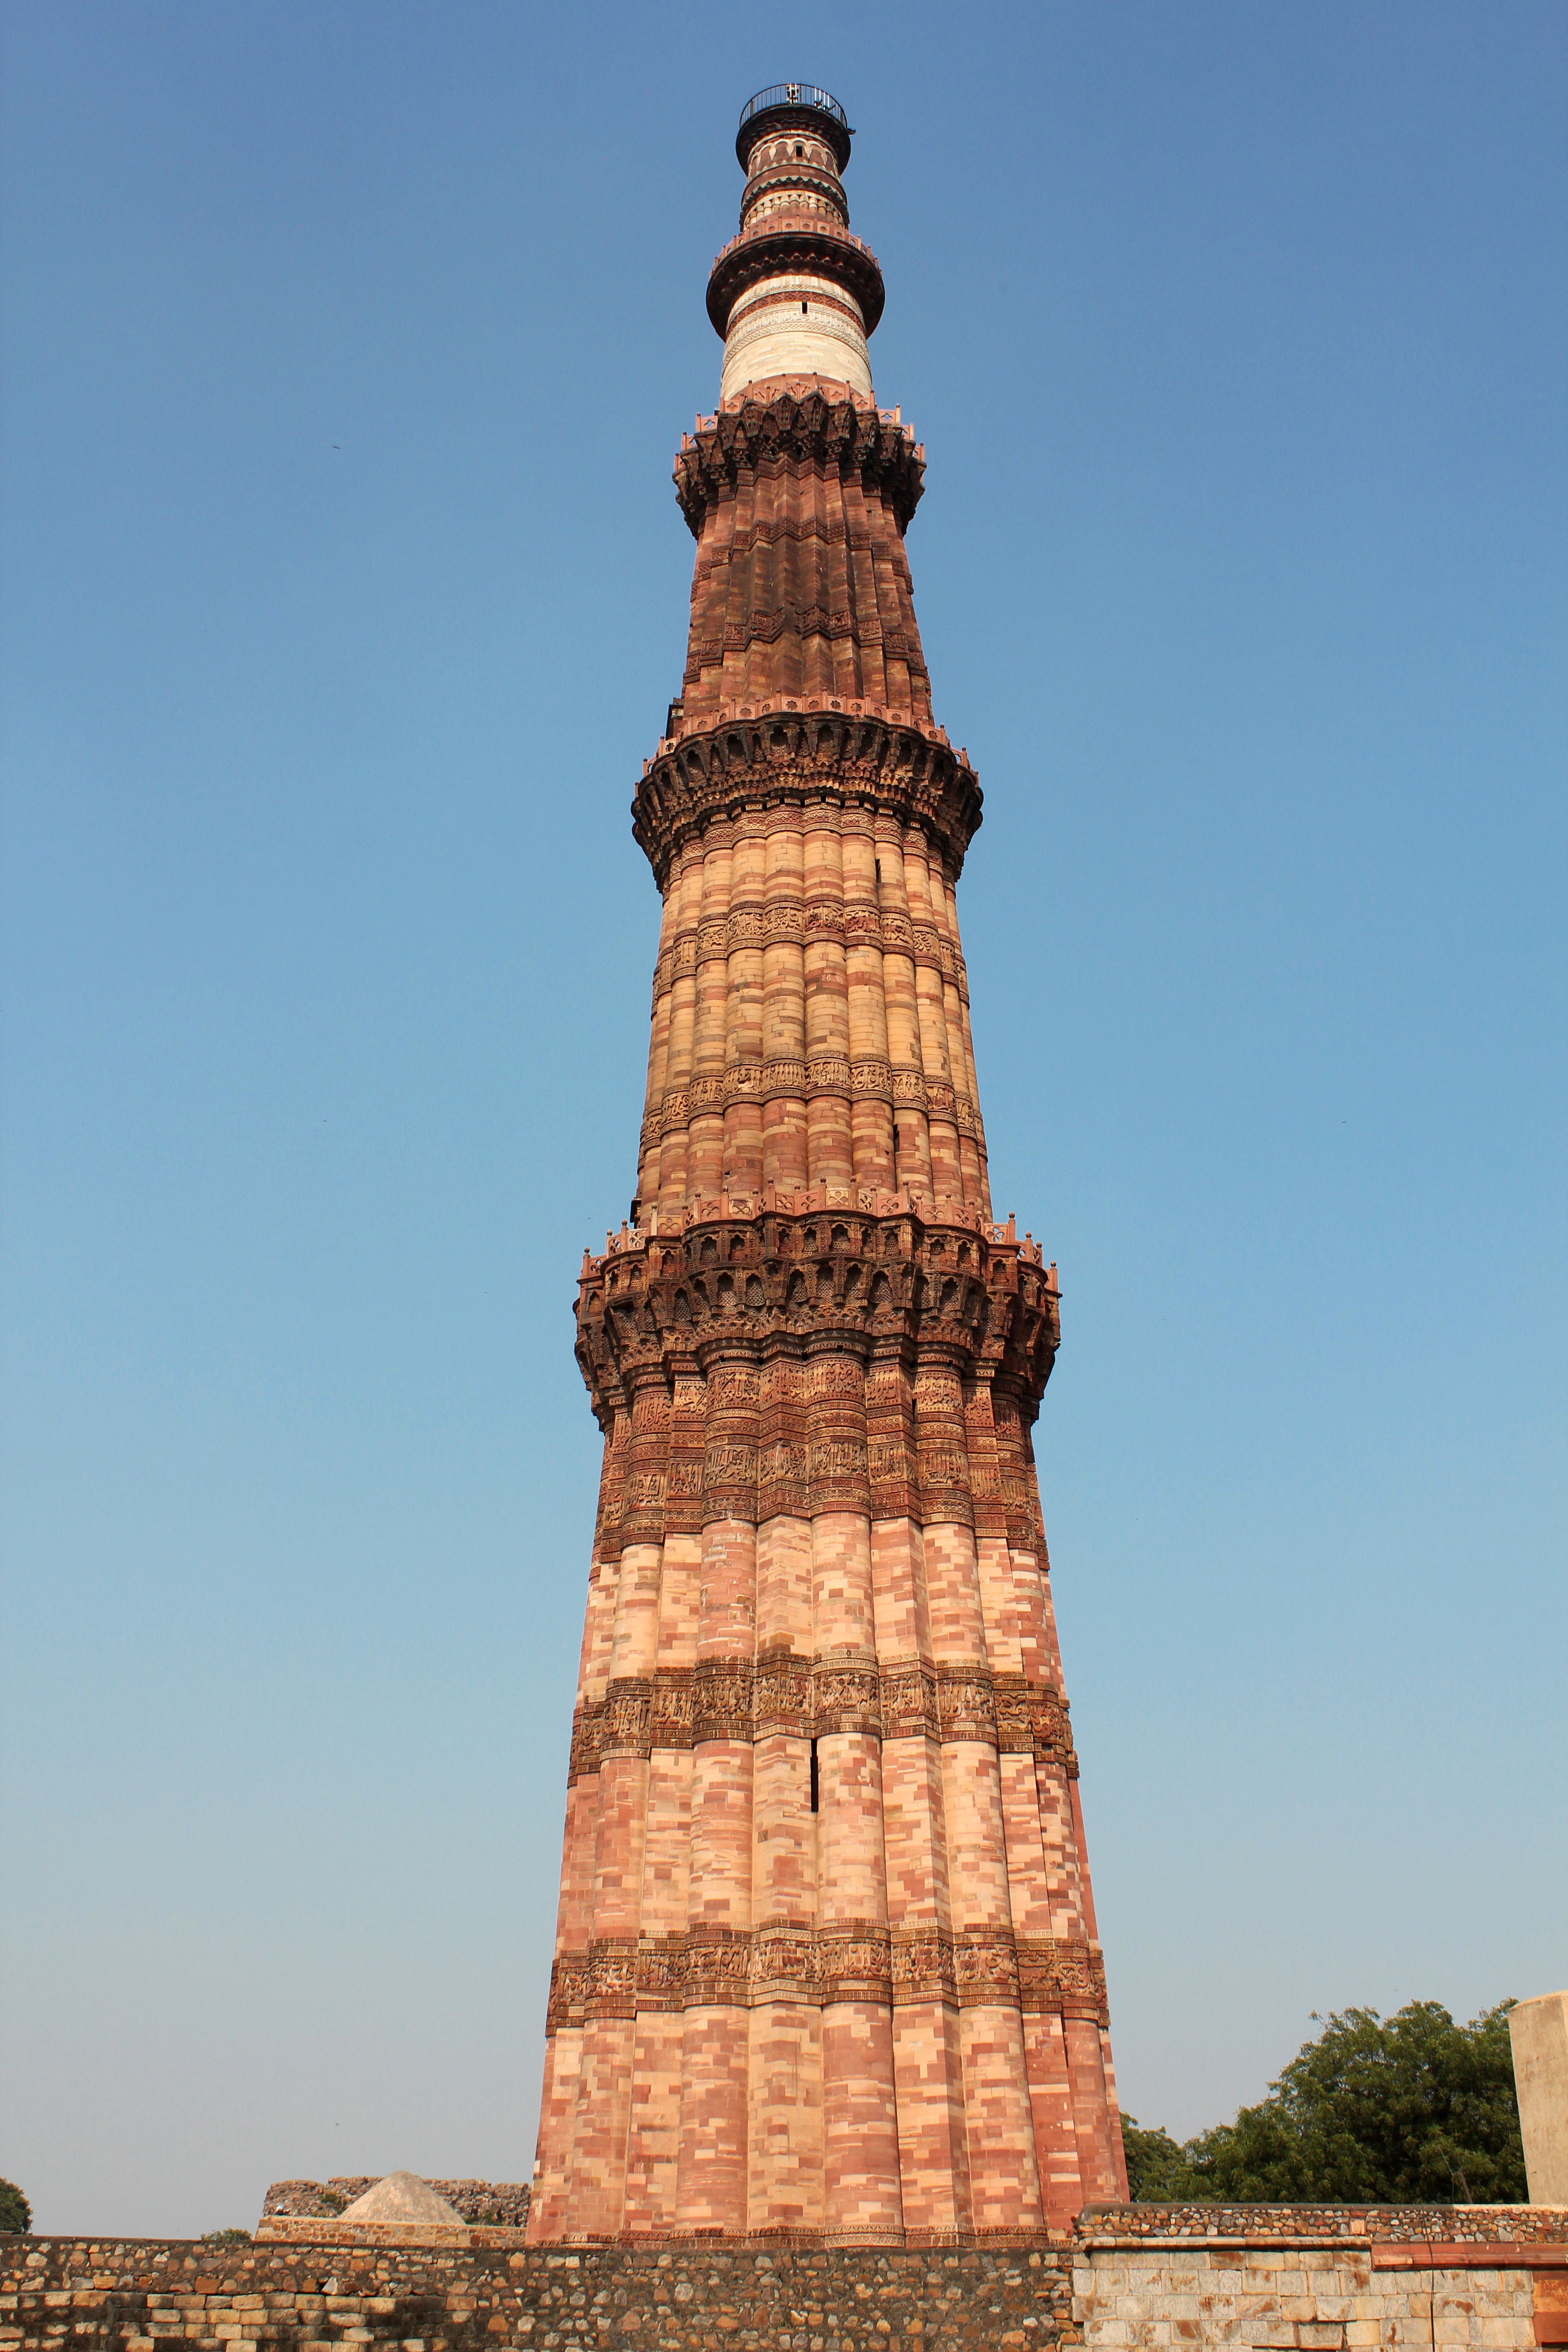 #atozchallenge - Qutb Minar